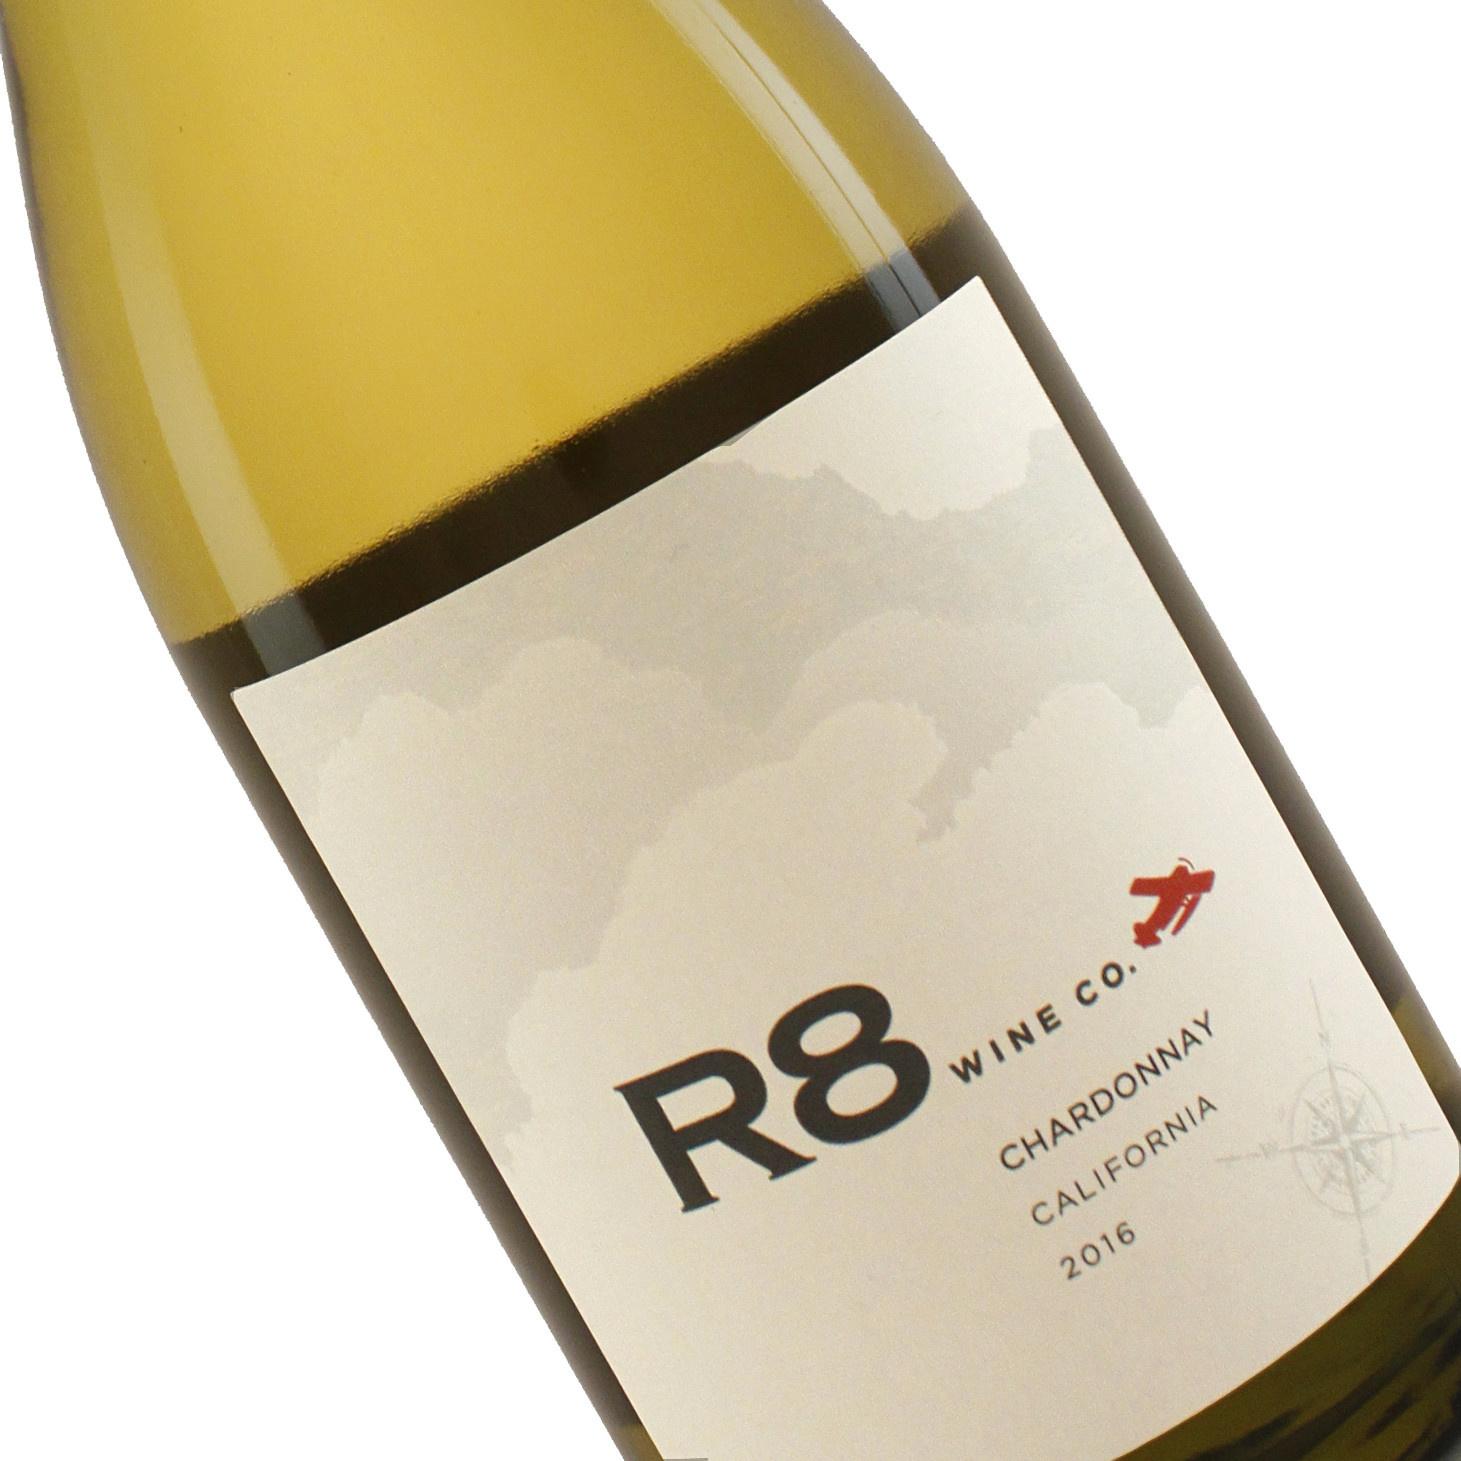 R8 Wine Co. 2016 Chardonnay, California